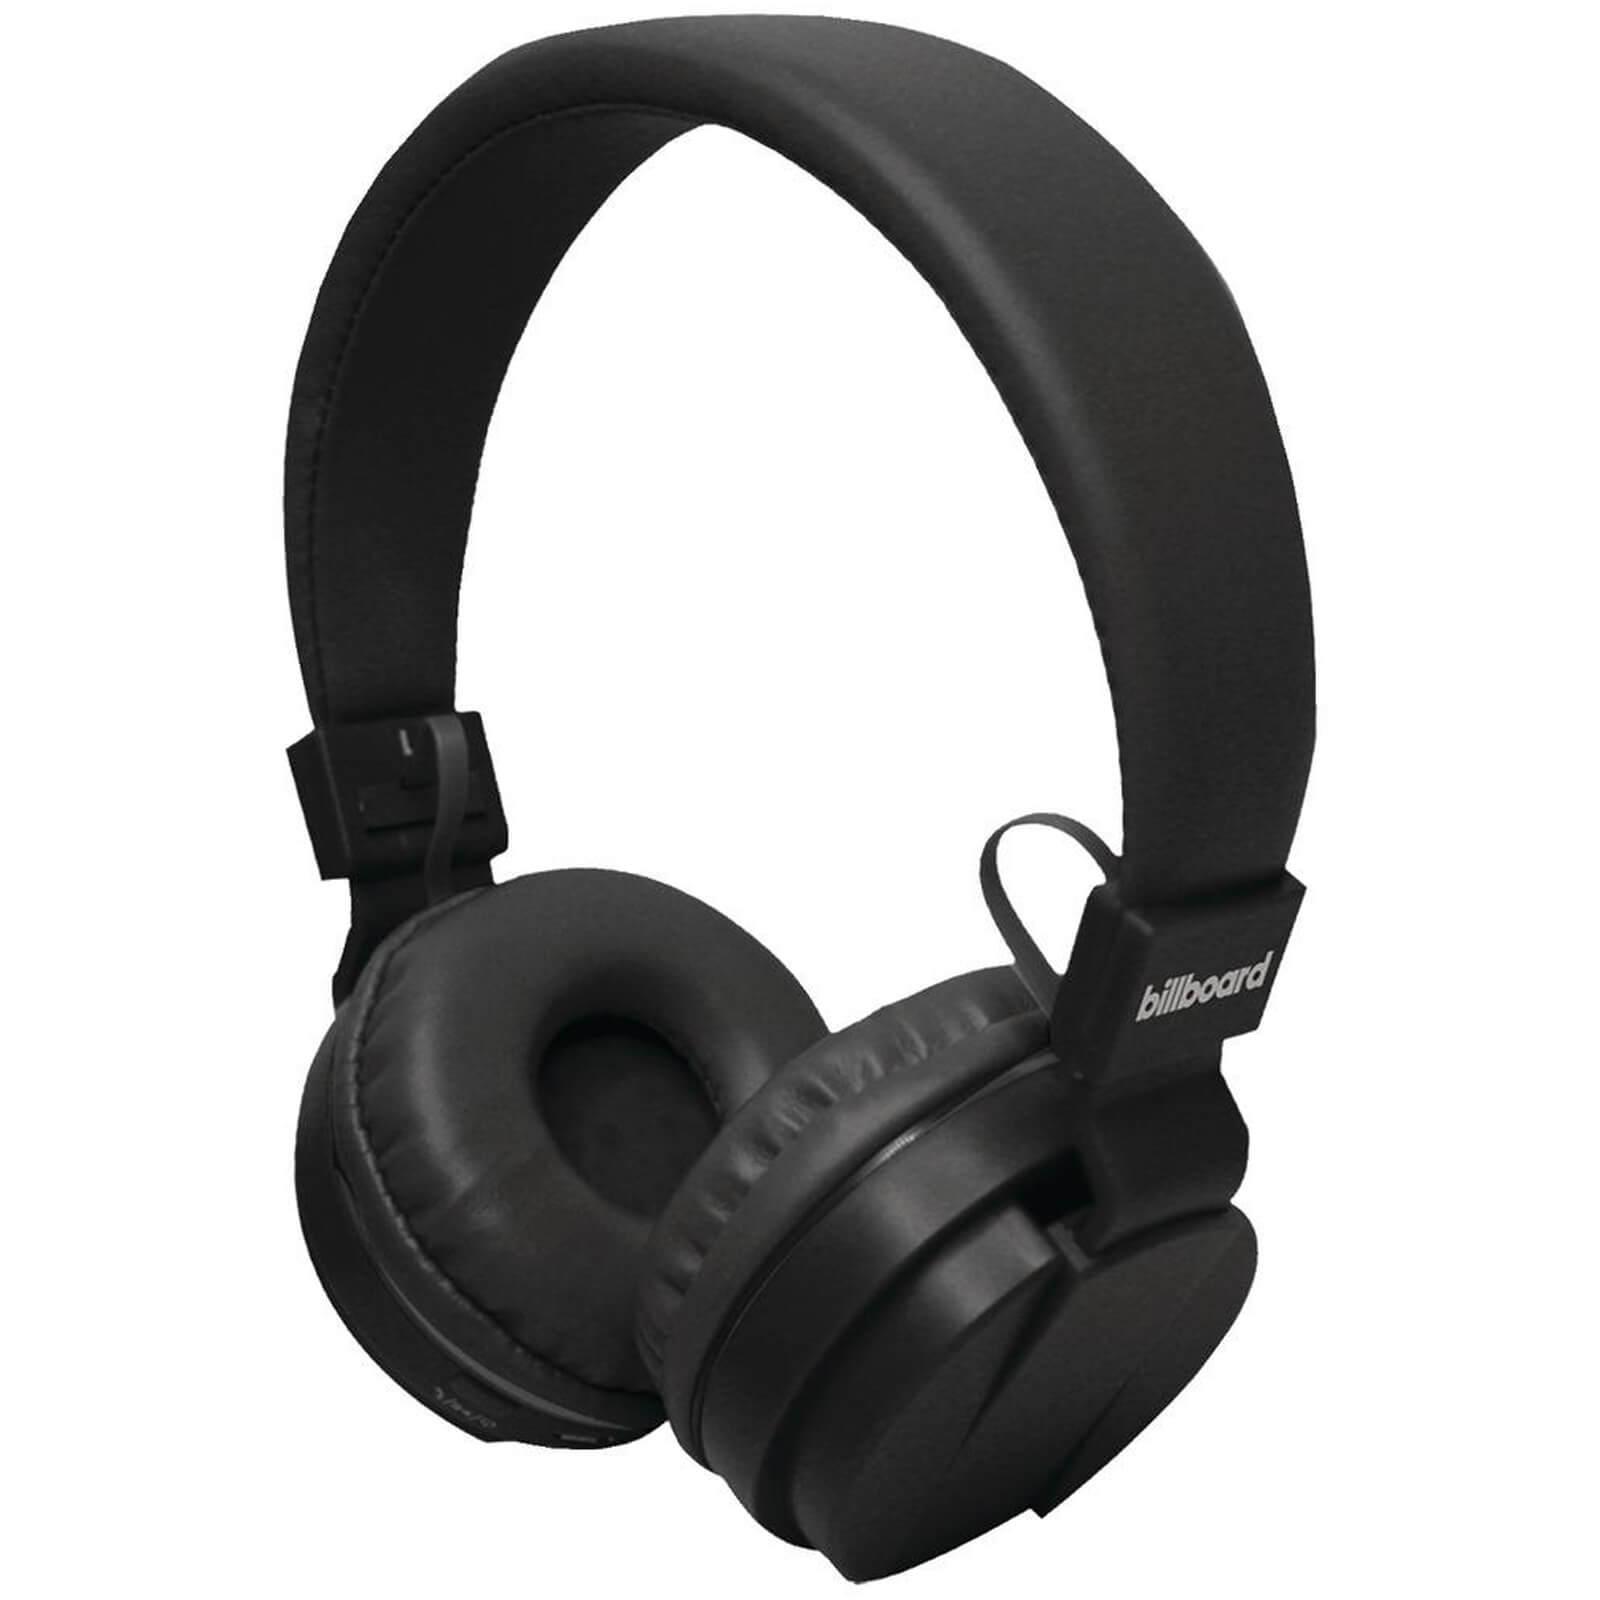 Kabellose Bluetooth Over-ear Kopfhörer Billboard MG509 mit Mikrofon - Schwarz